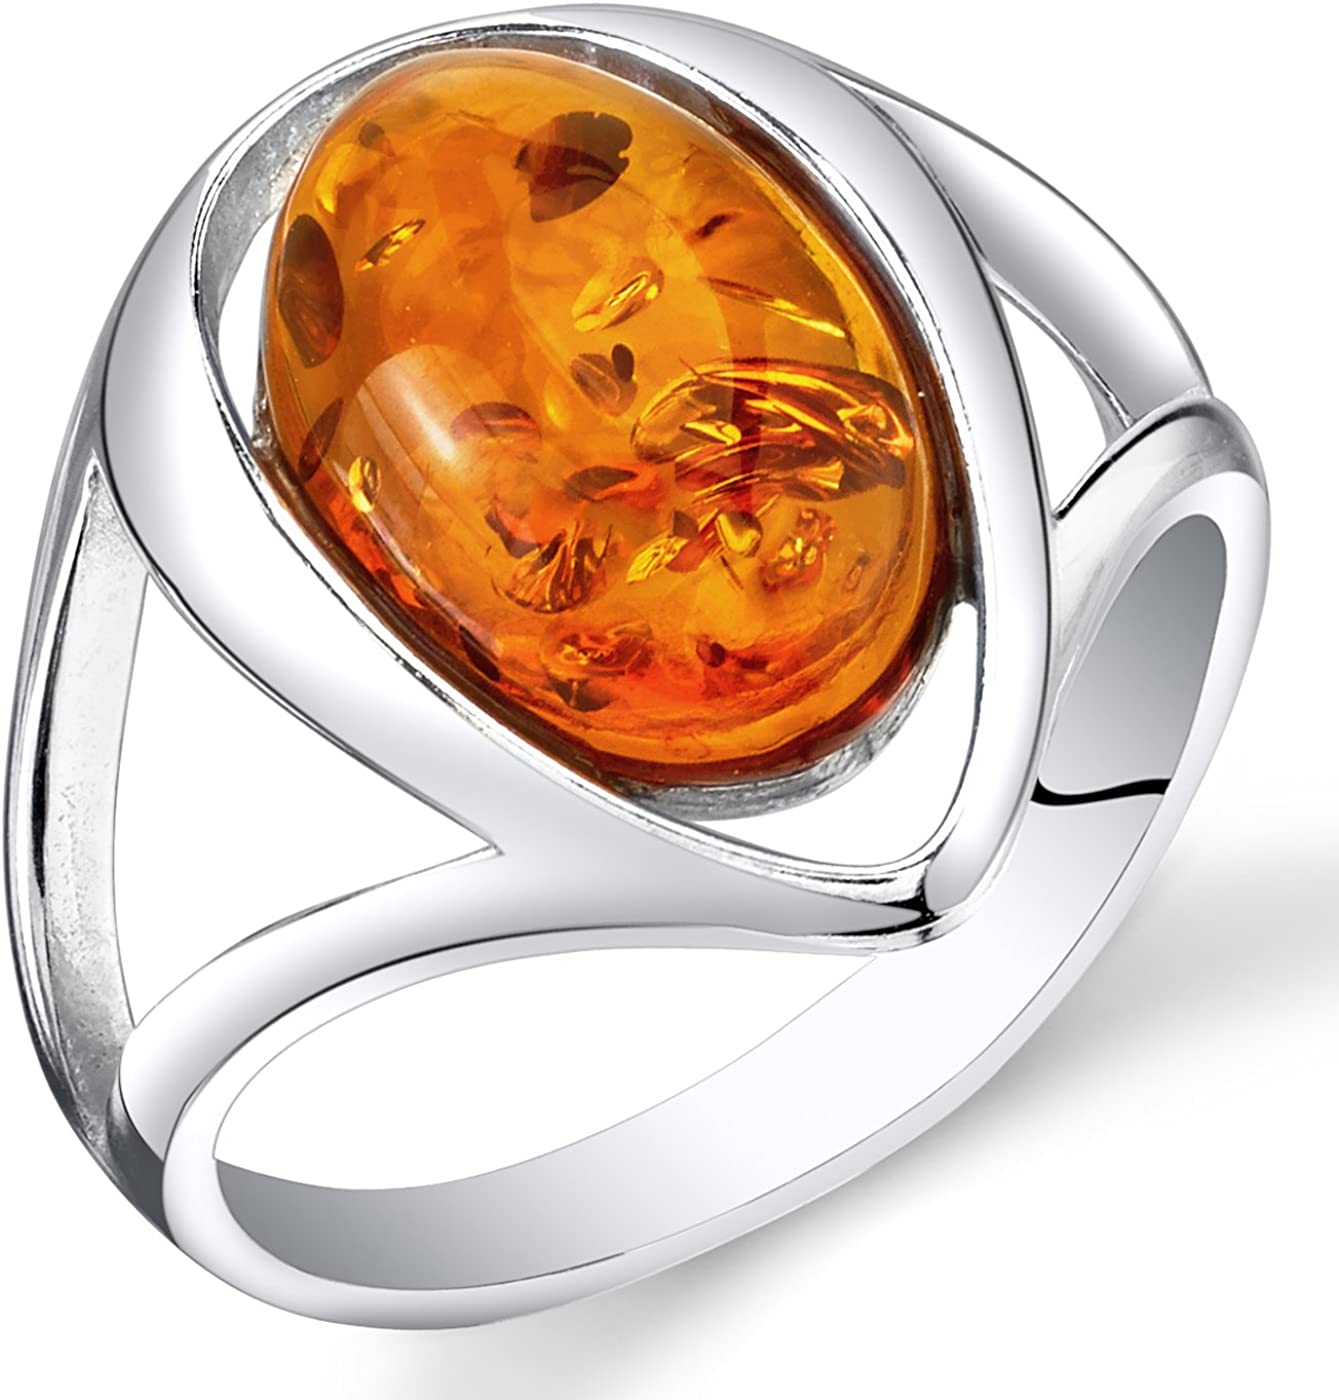 Amber Ring Woman/'s Ring Amber Silver Ring Artisan Ring Sterling Amber Ring Silver Amber Ring Oval Ring Vintage Ring Leaf Ring